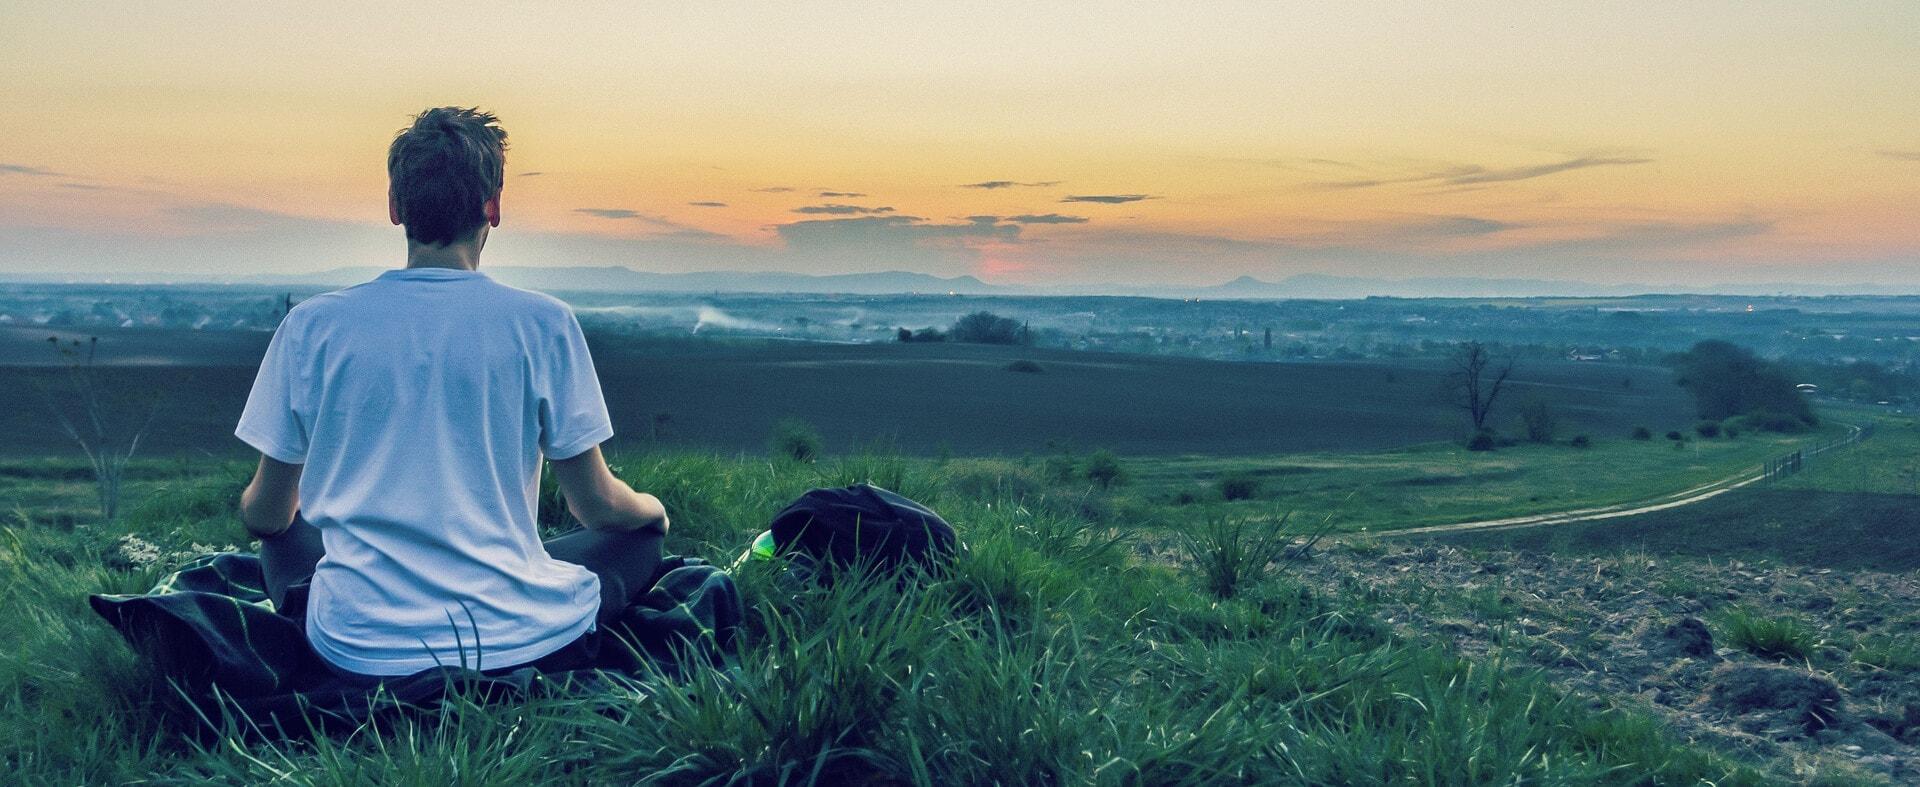 meditationejaculationcontrol